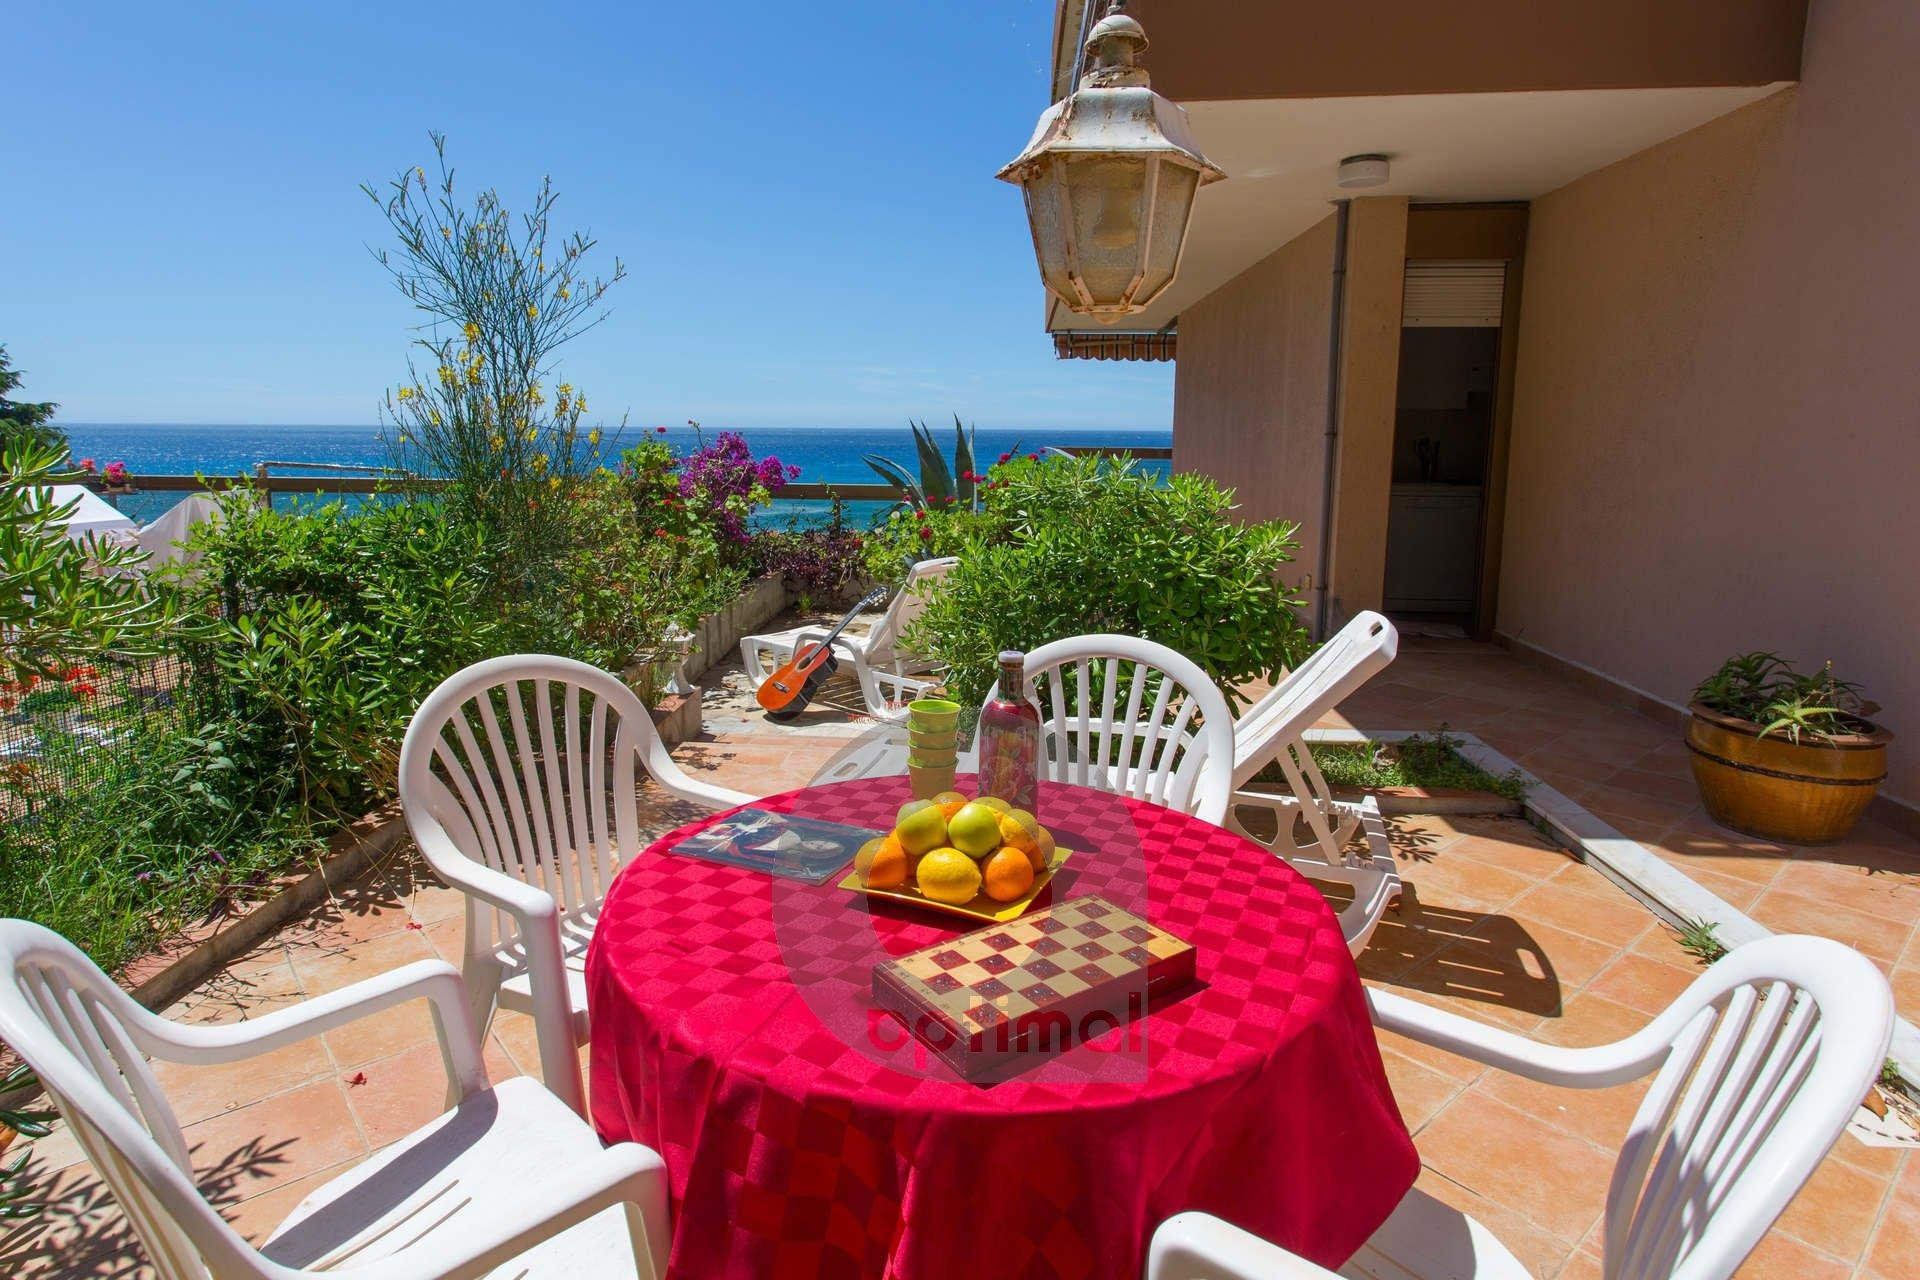 Beau 2Pmoderne avec terrasse face mer